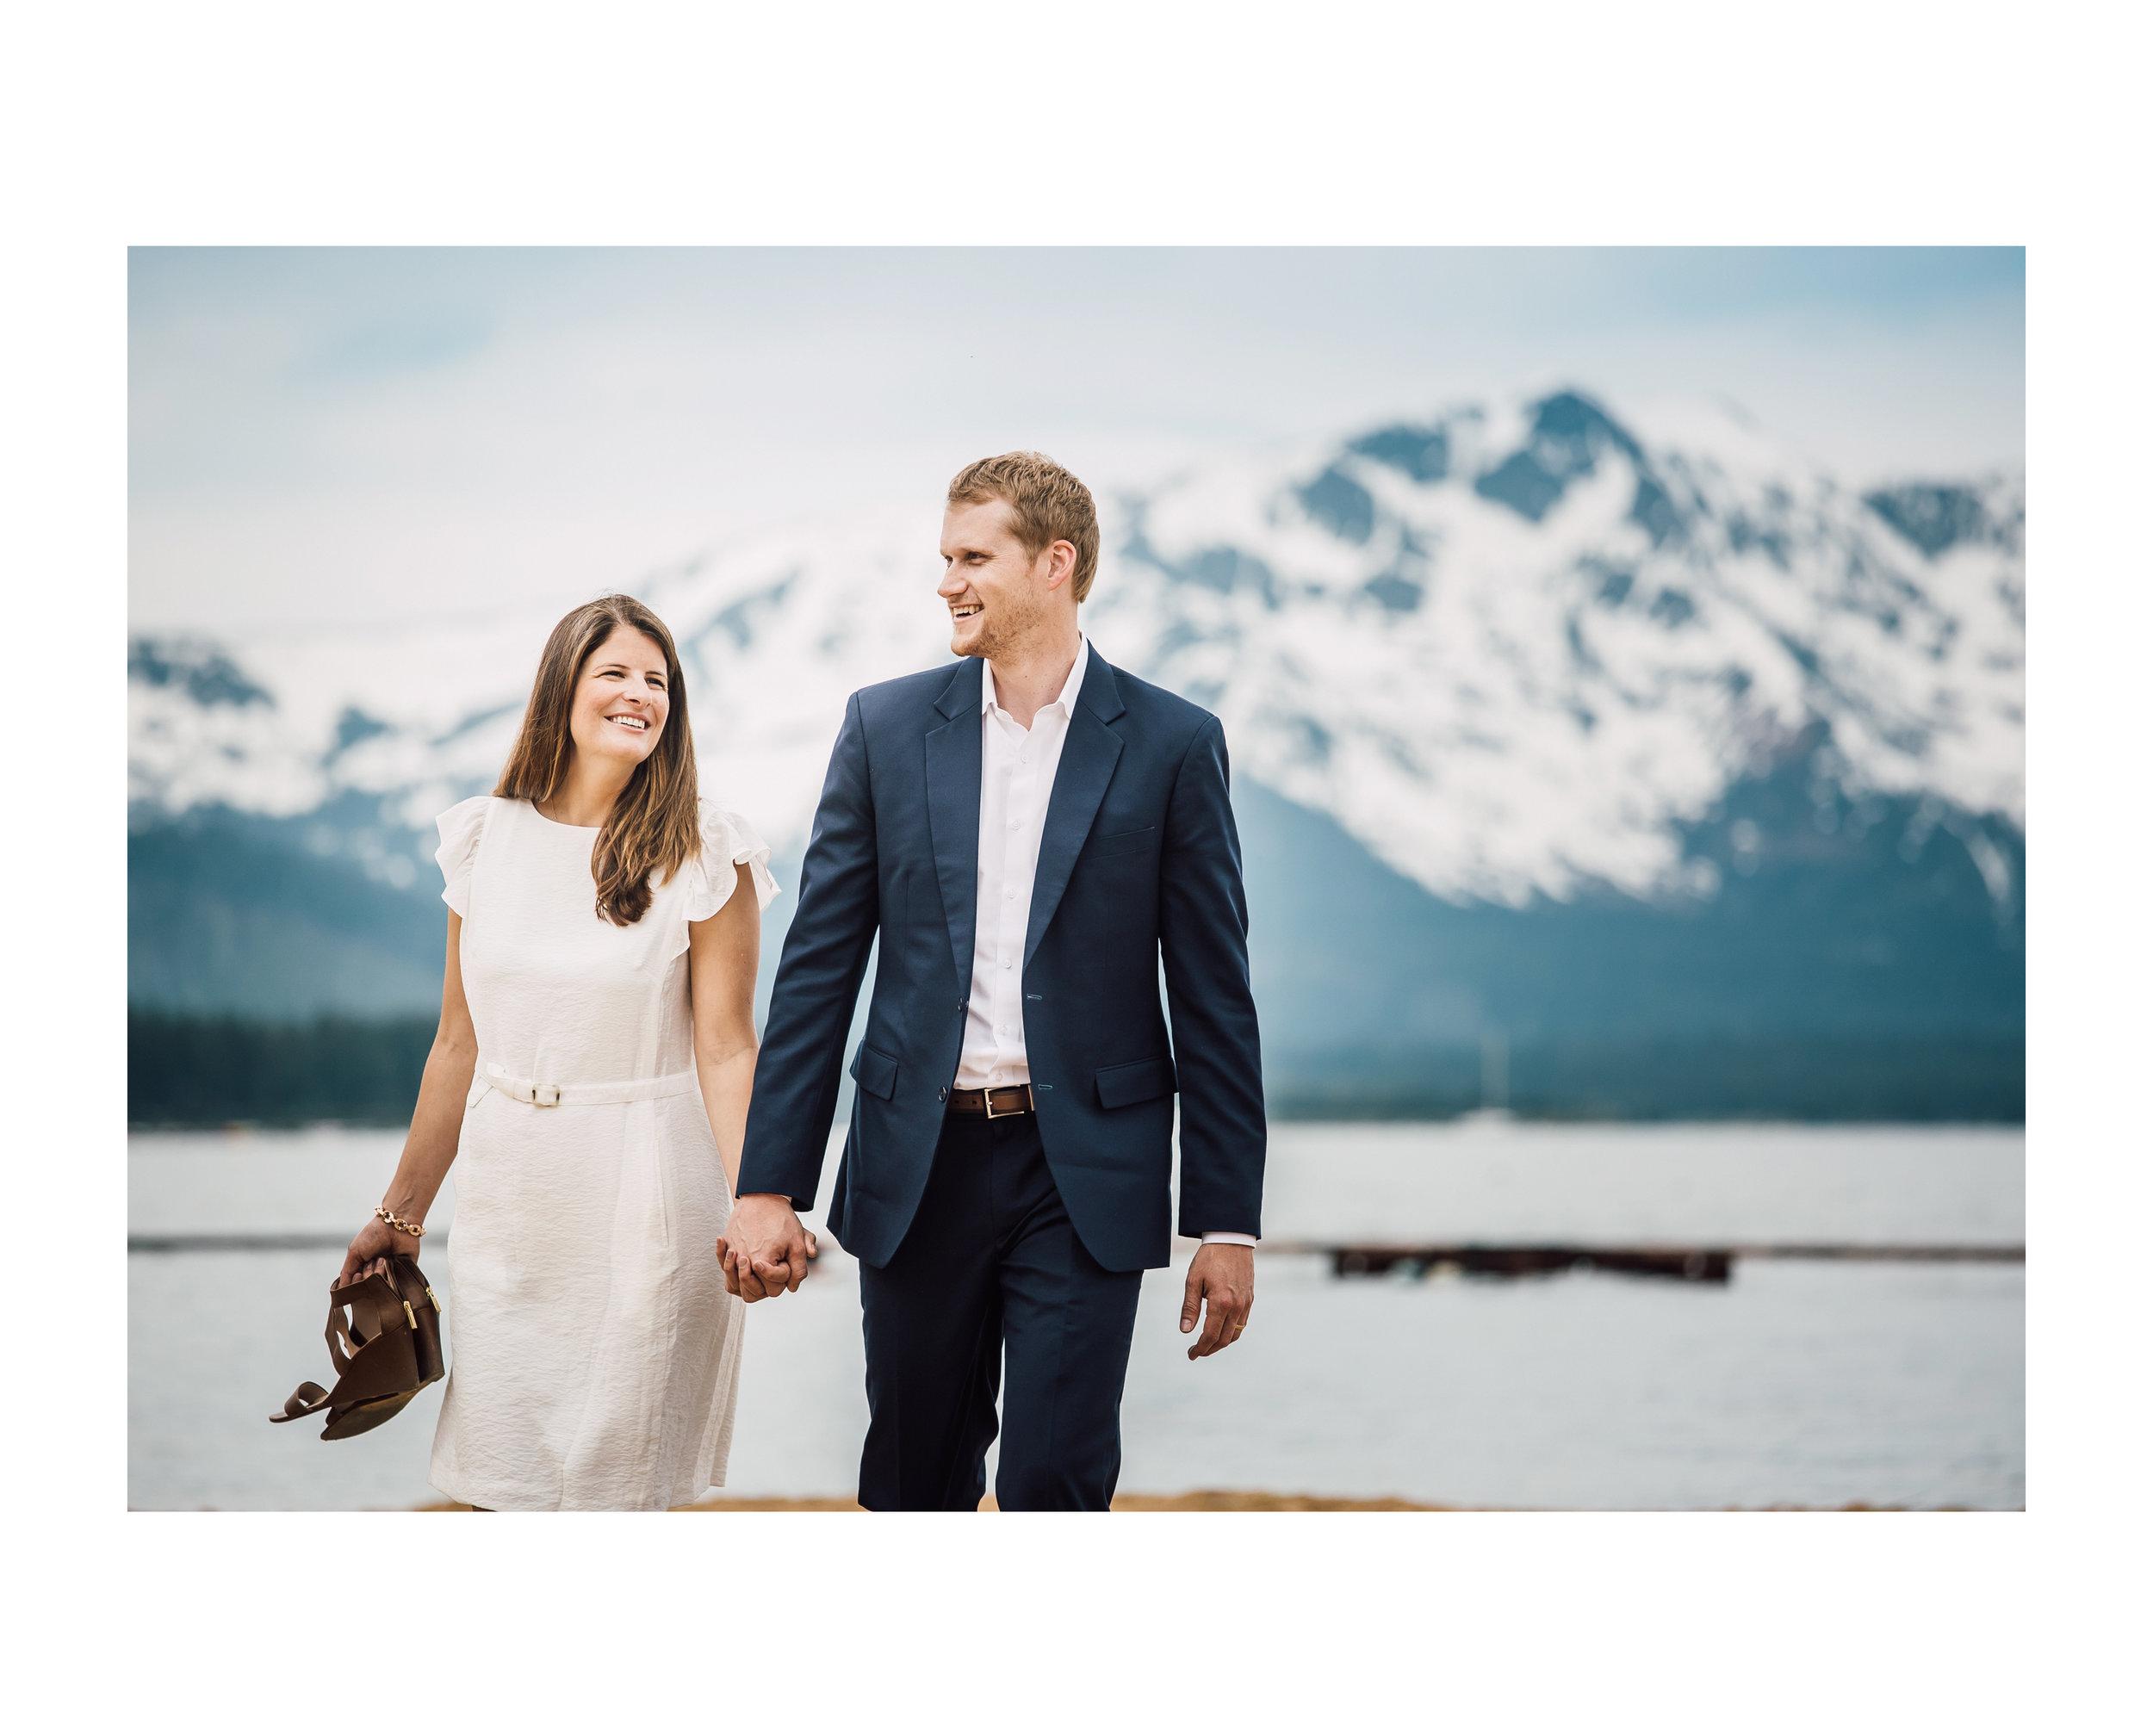 Melisa&David_Wedding_Day_001.jpg